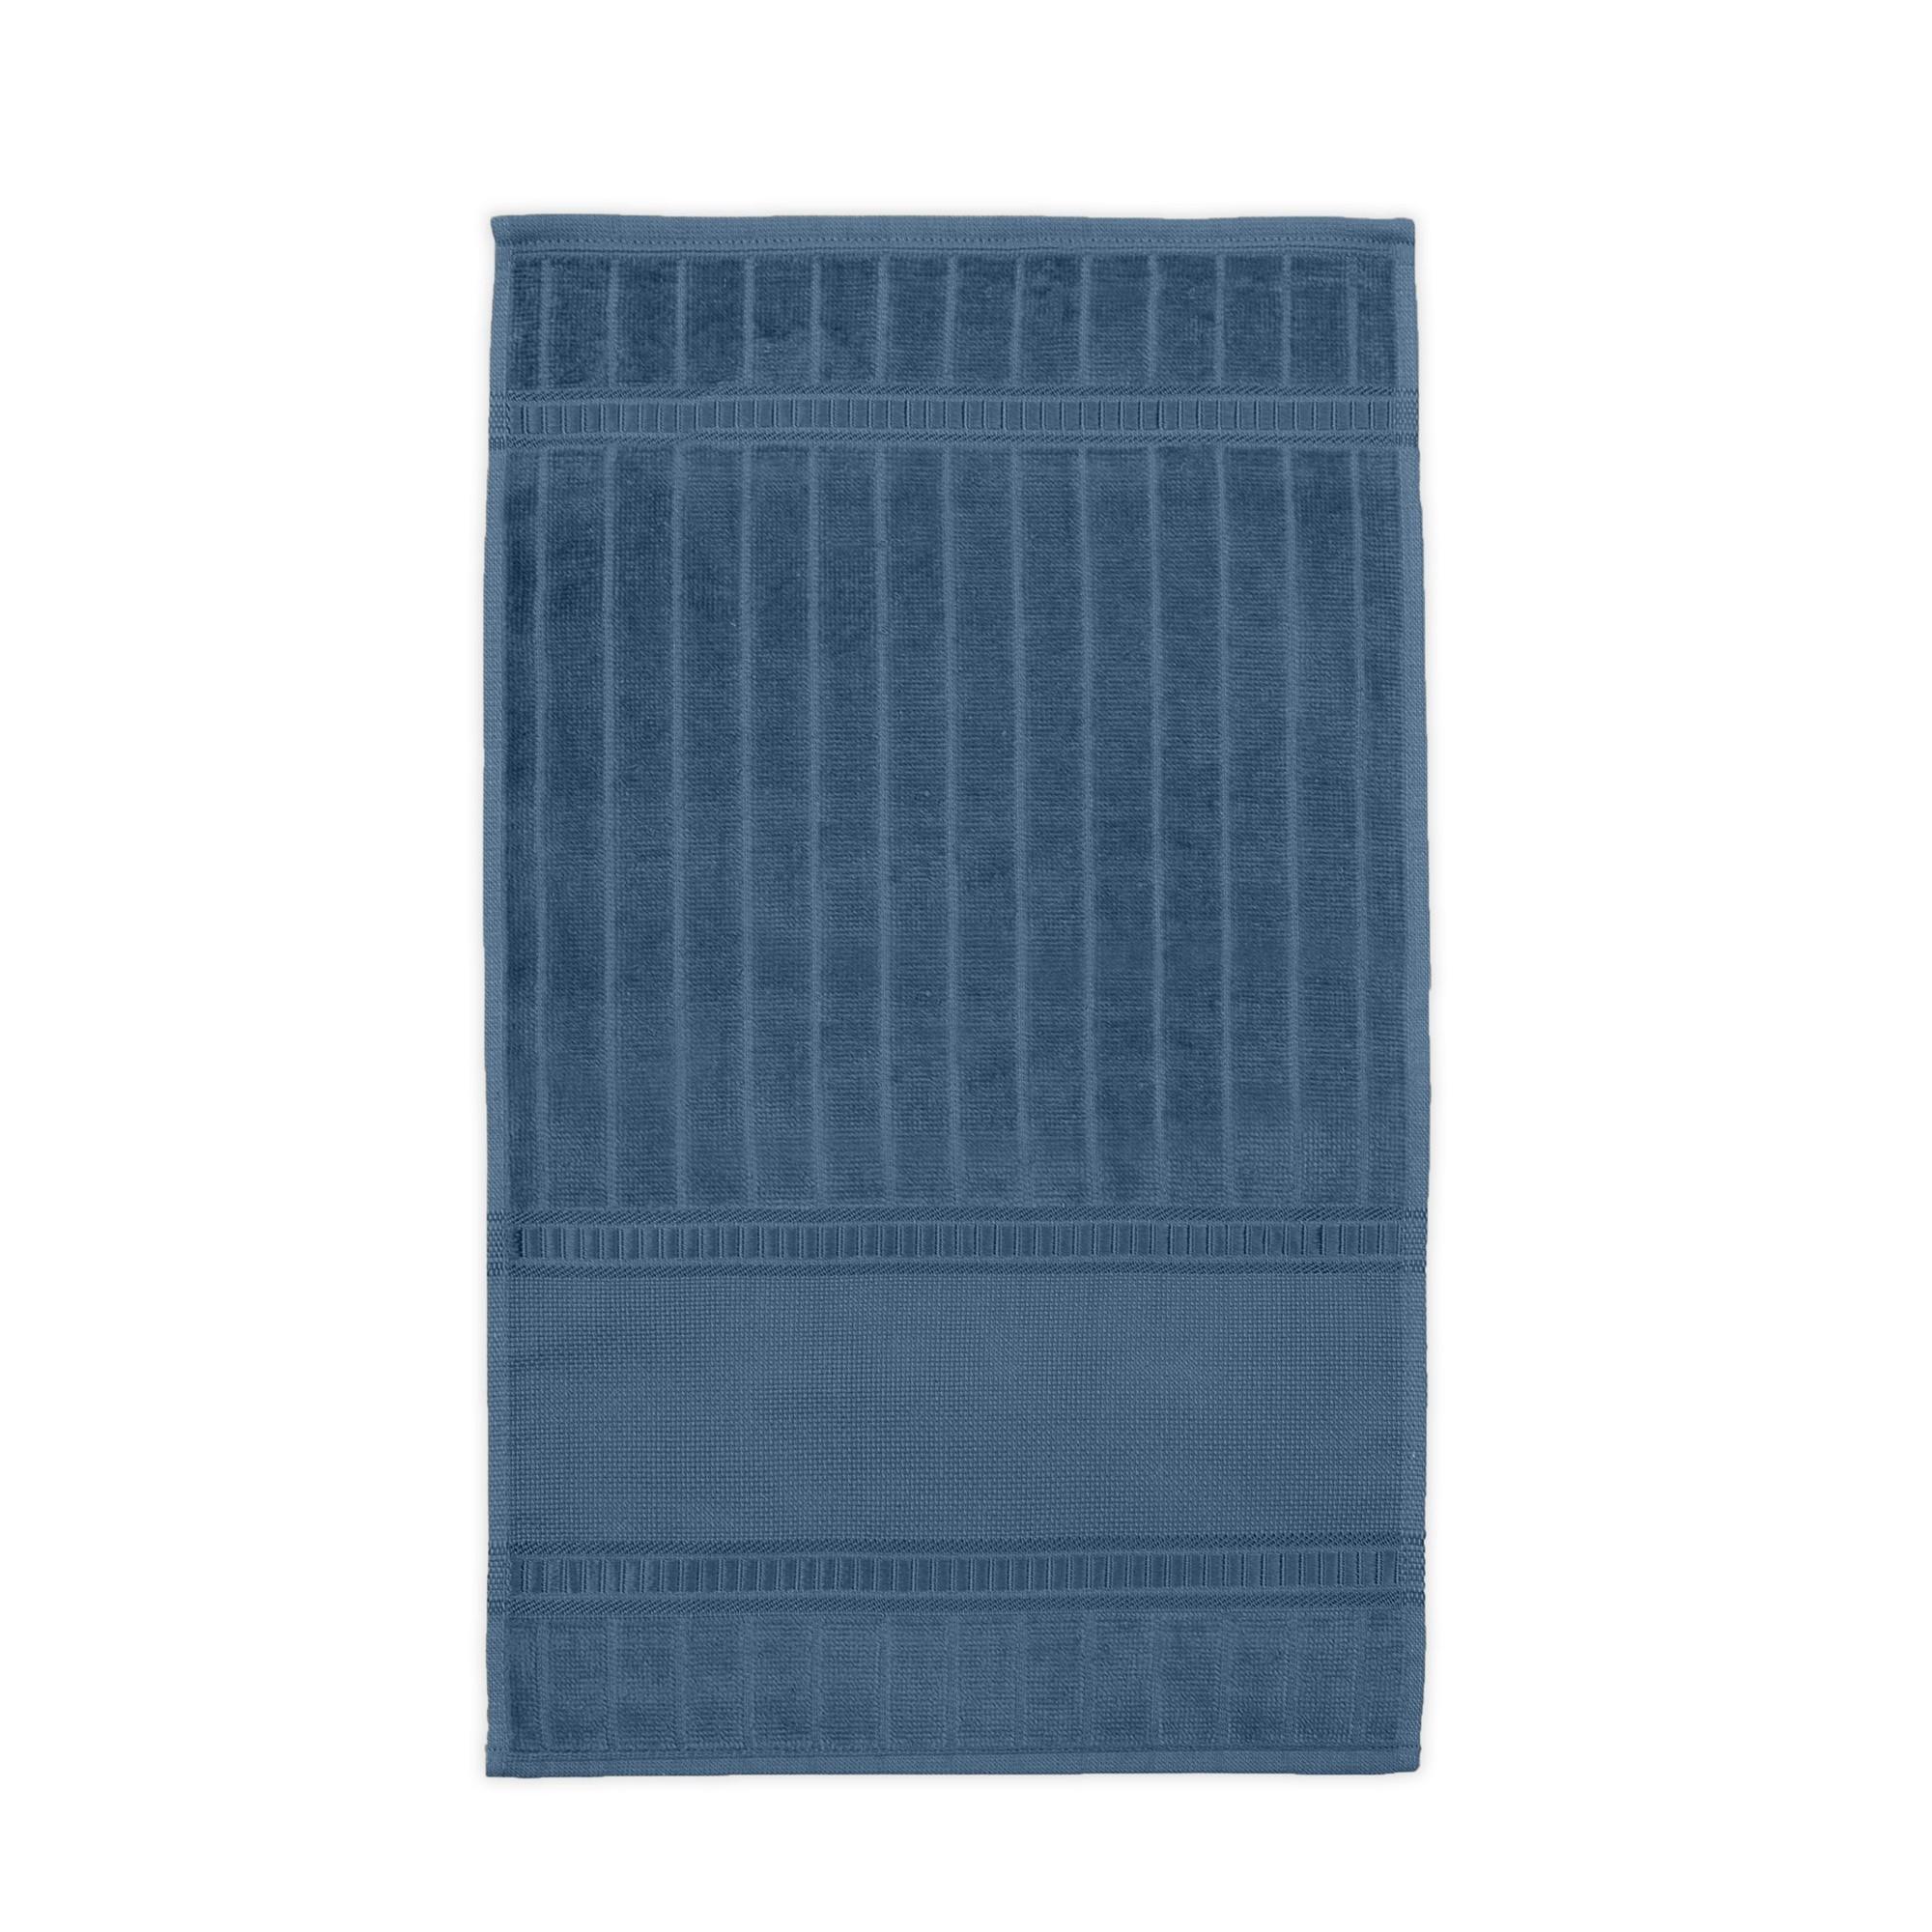 Toalha Lavabo Carprice Luxo 100 Algodao 30x50 cm Azul - Buettner